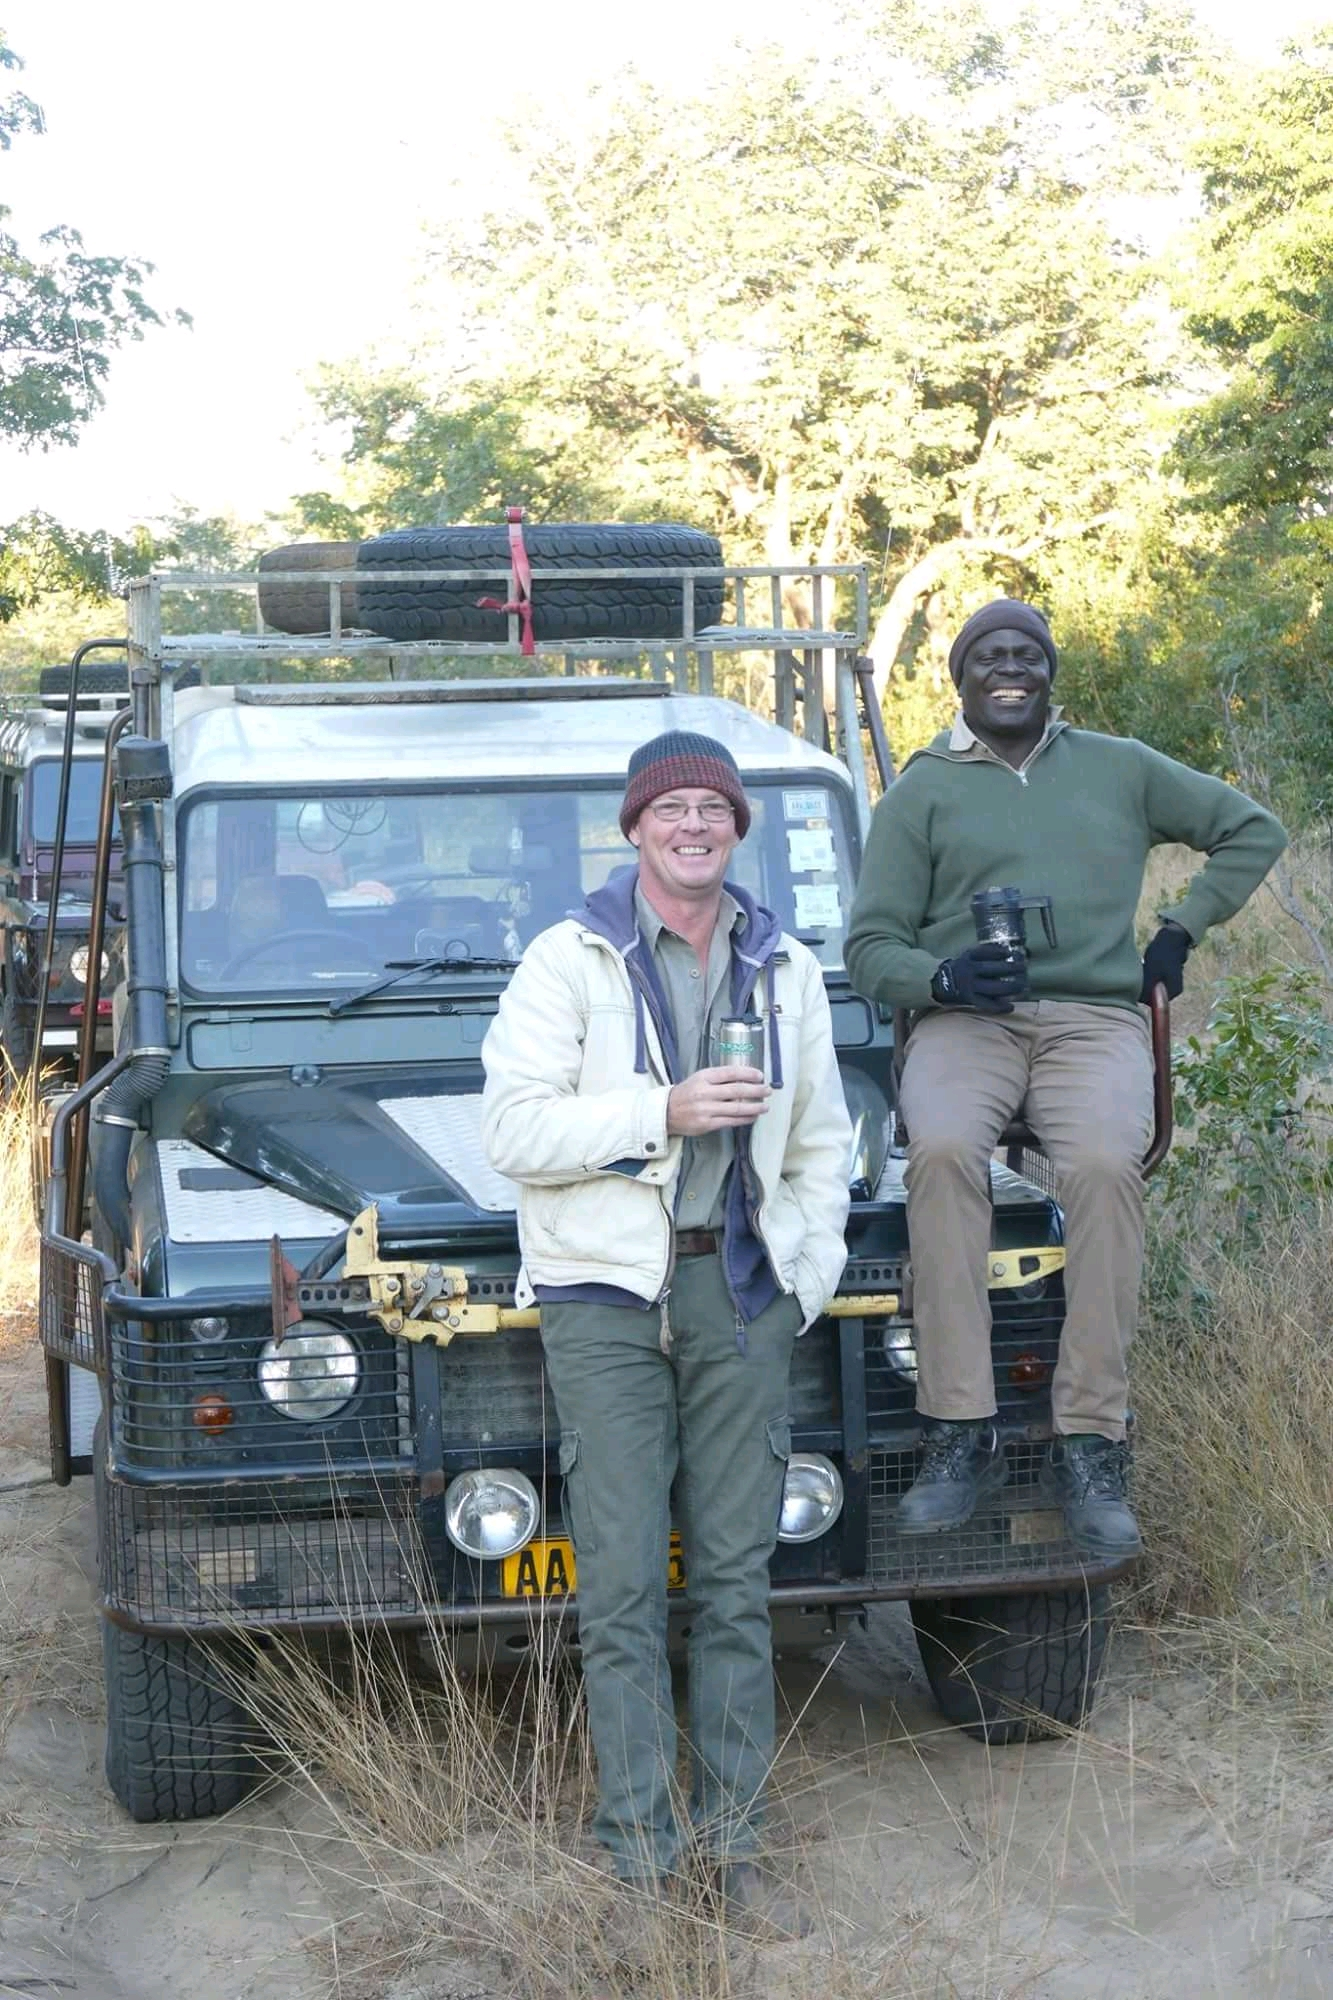 Peter Blinston and Jealous Mpofu